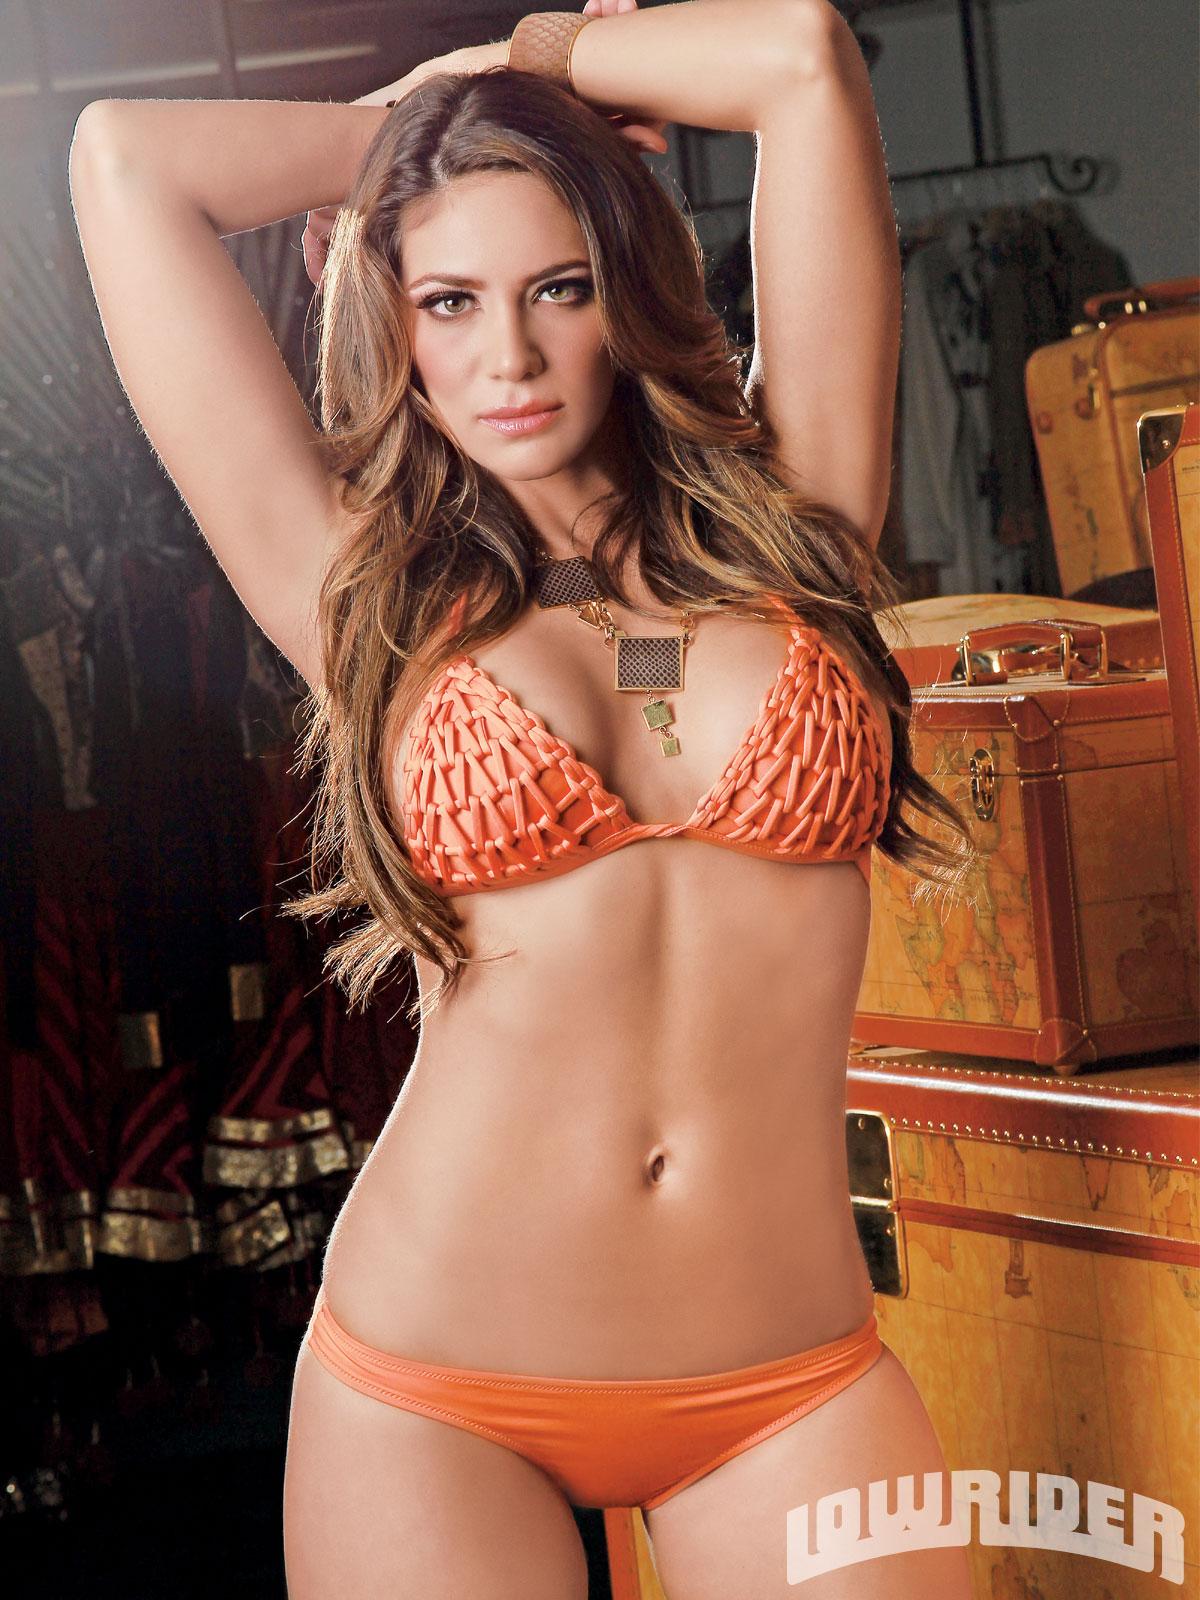 Melany Lowrider Girls Model Lowrider Girls Magazine